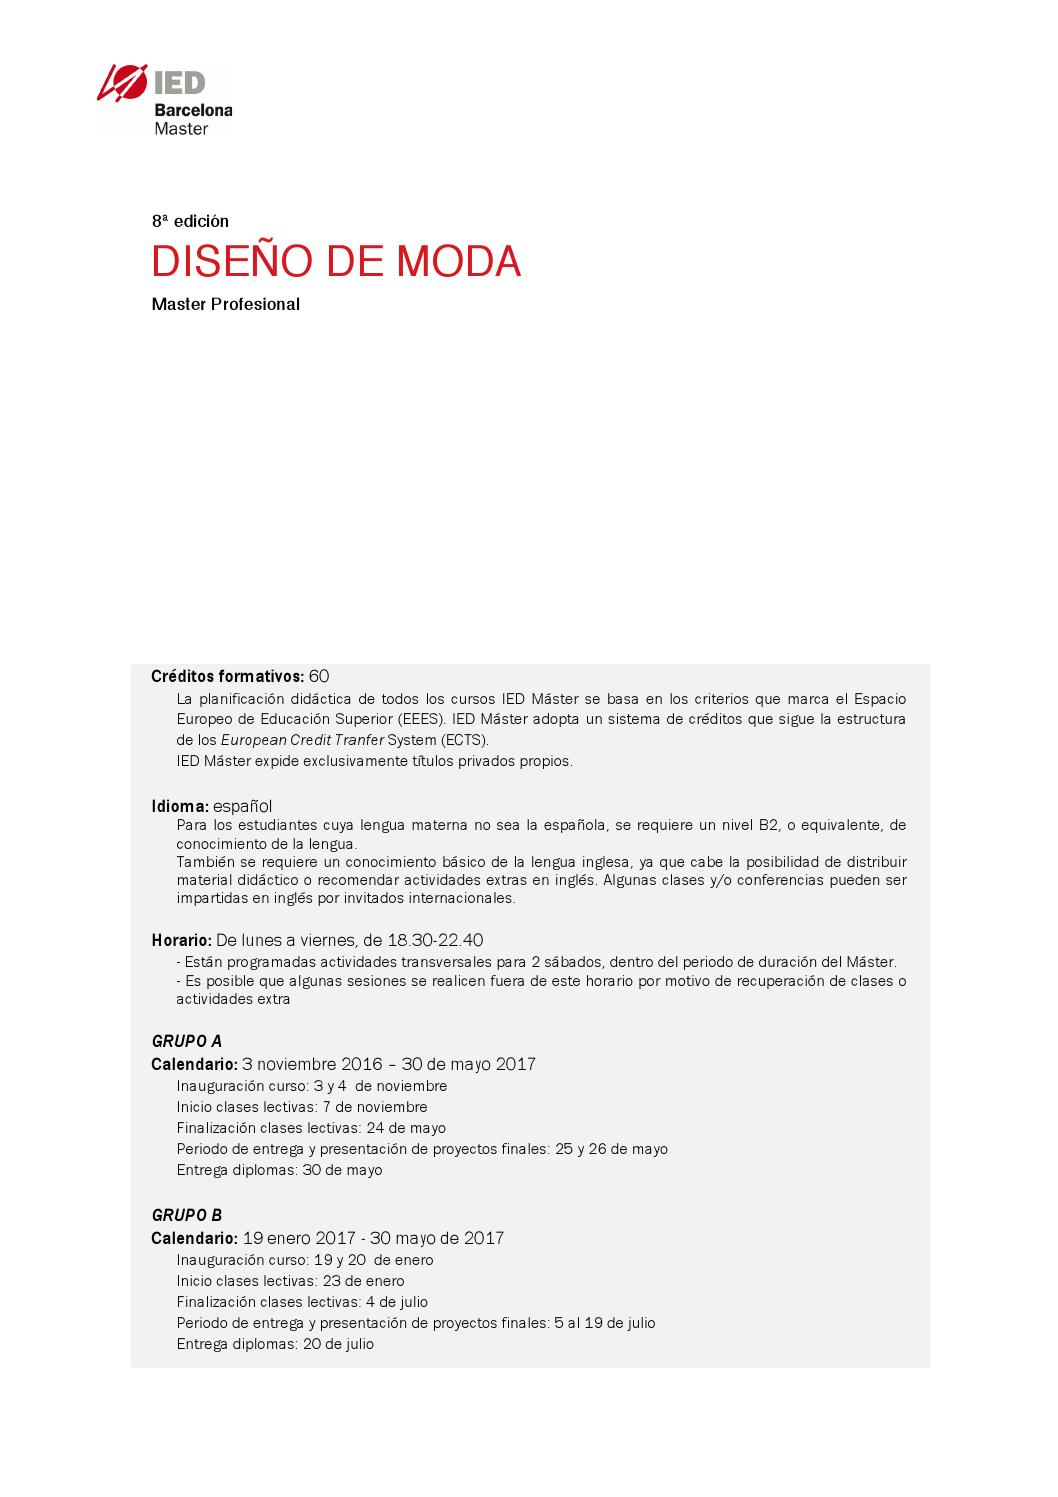 Master Diseño de Moda by IED Barcelona - issuu